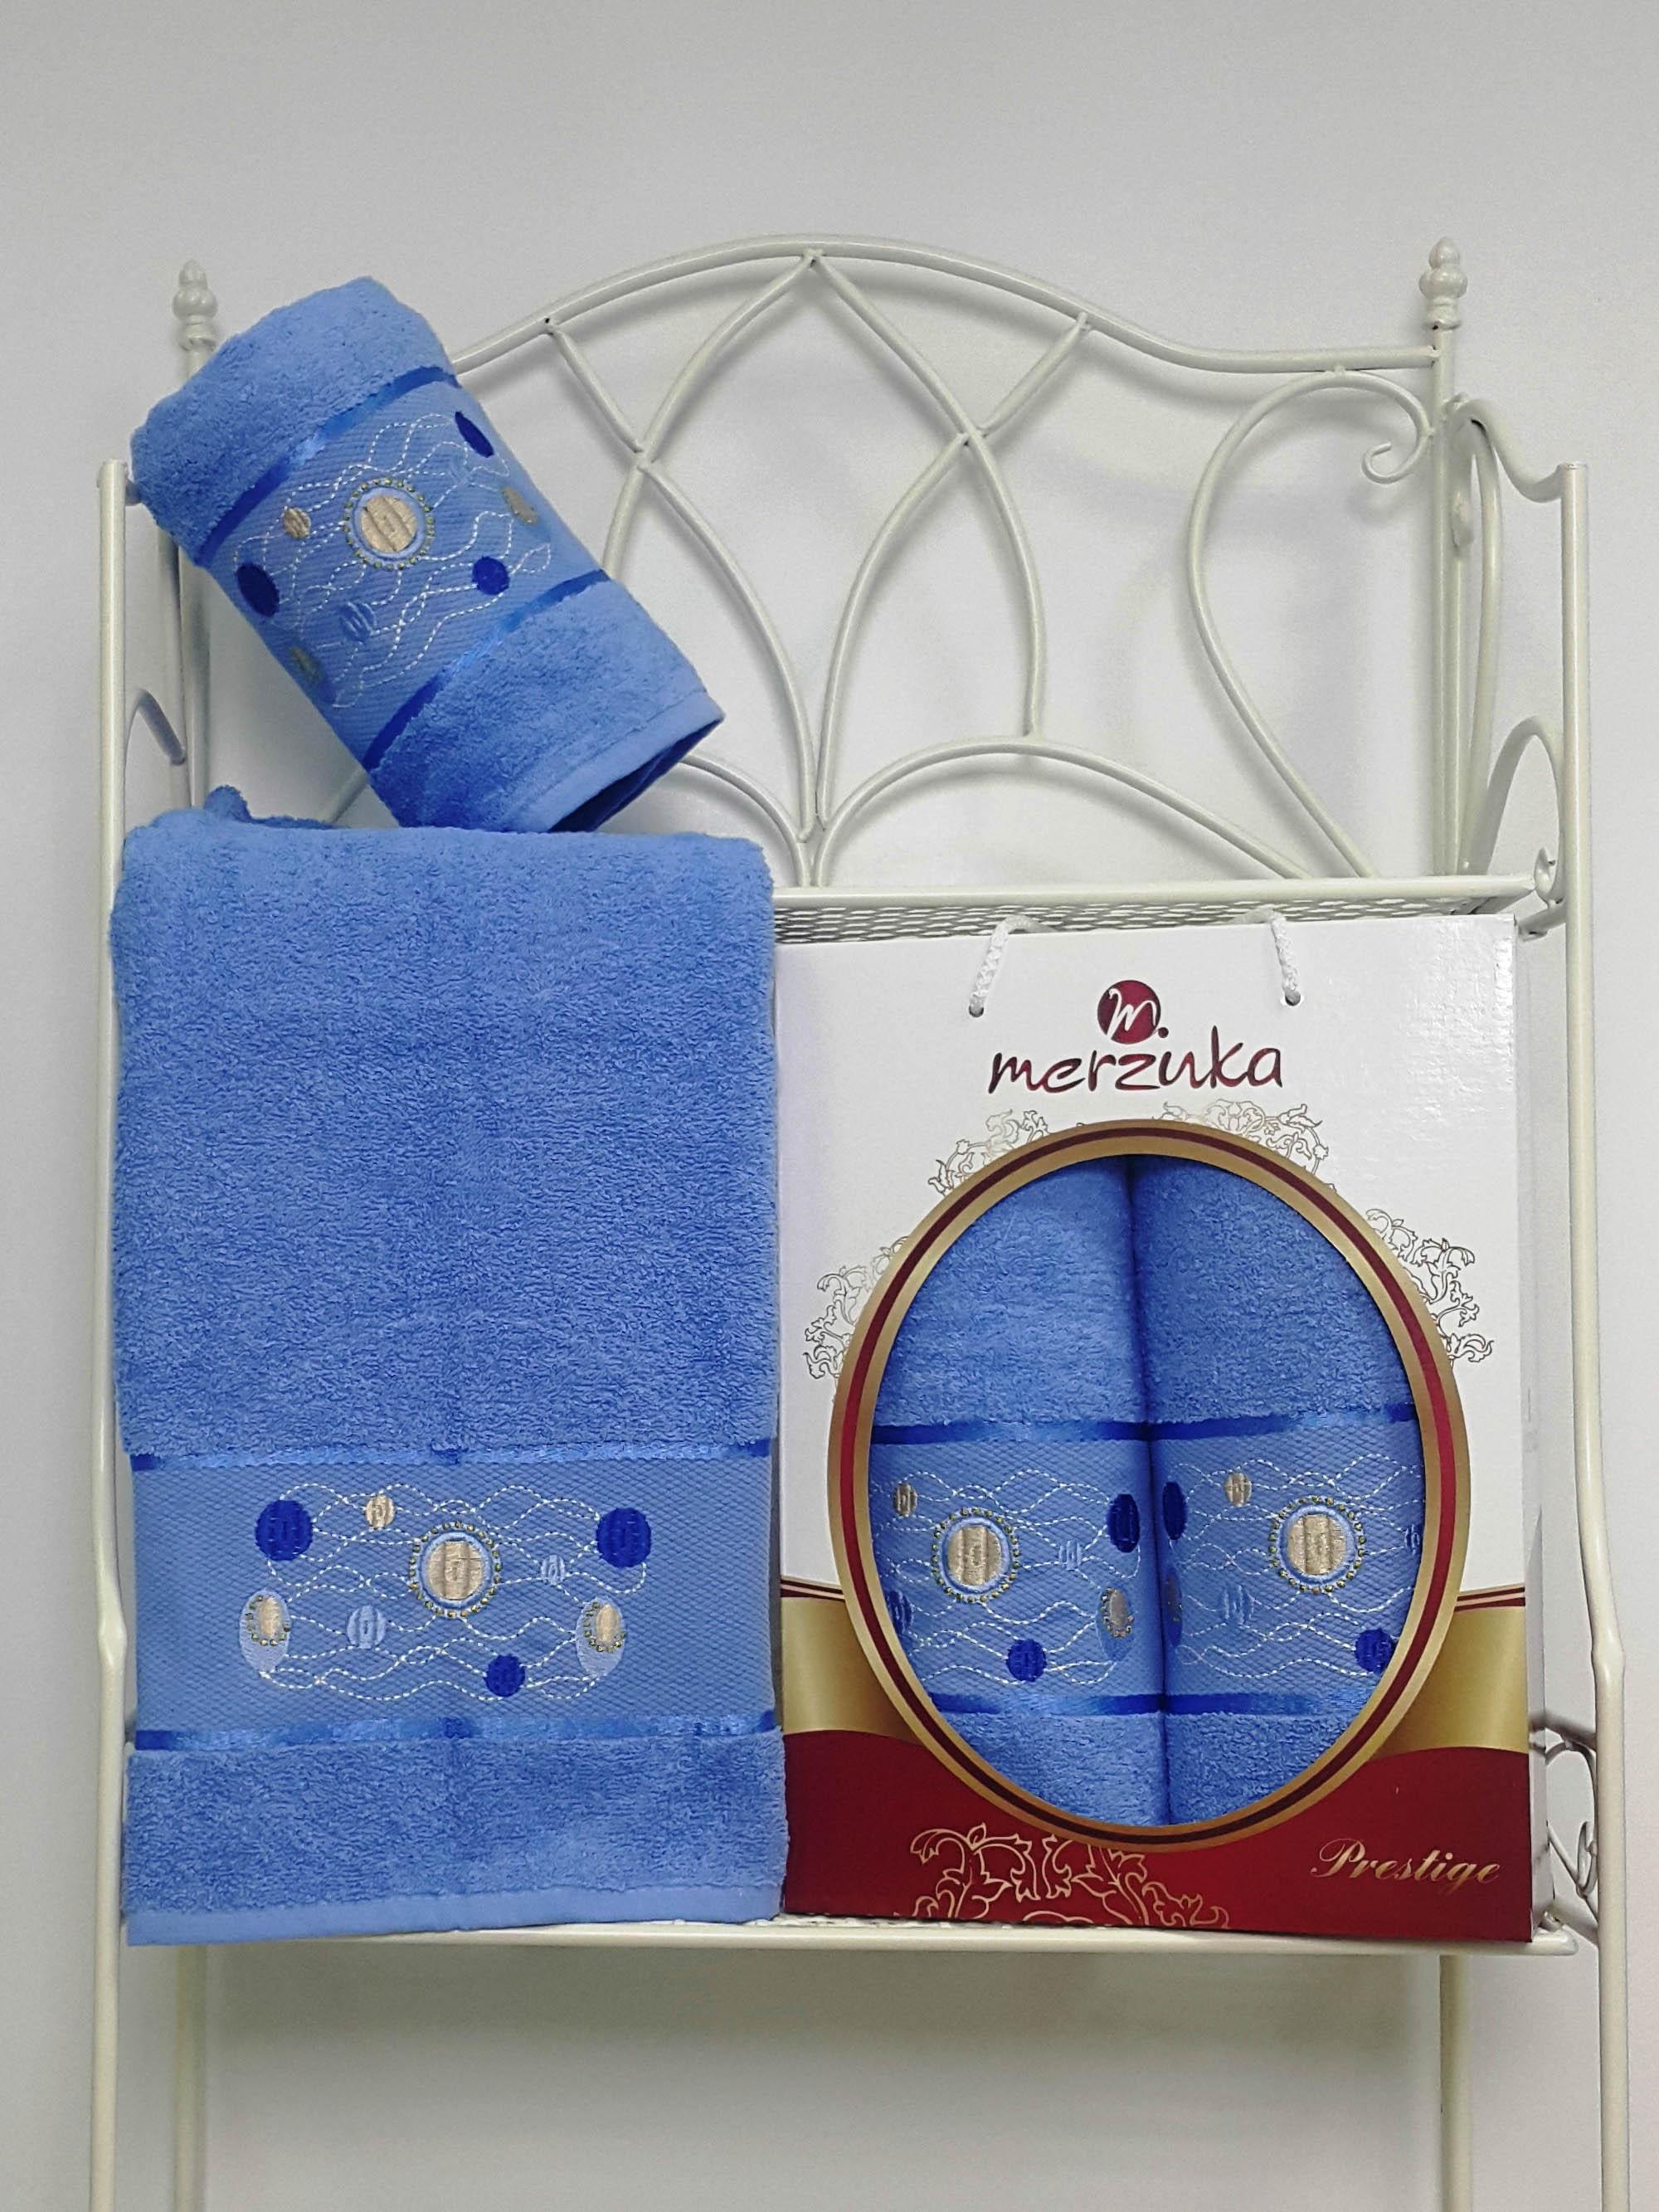 Полотенца Oran Merzuka Набор из 2 полотенец Prestij Цвет: Голубой набор из 3 полотенец merzuka sakura 50х90 2 70х140 8432 оранжевый